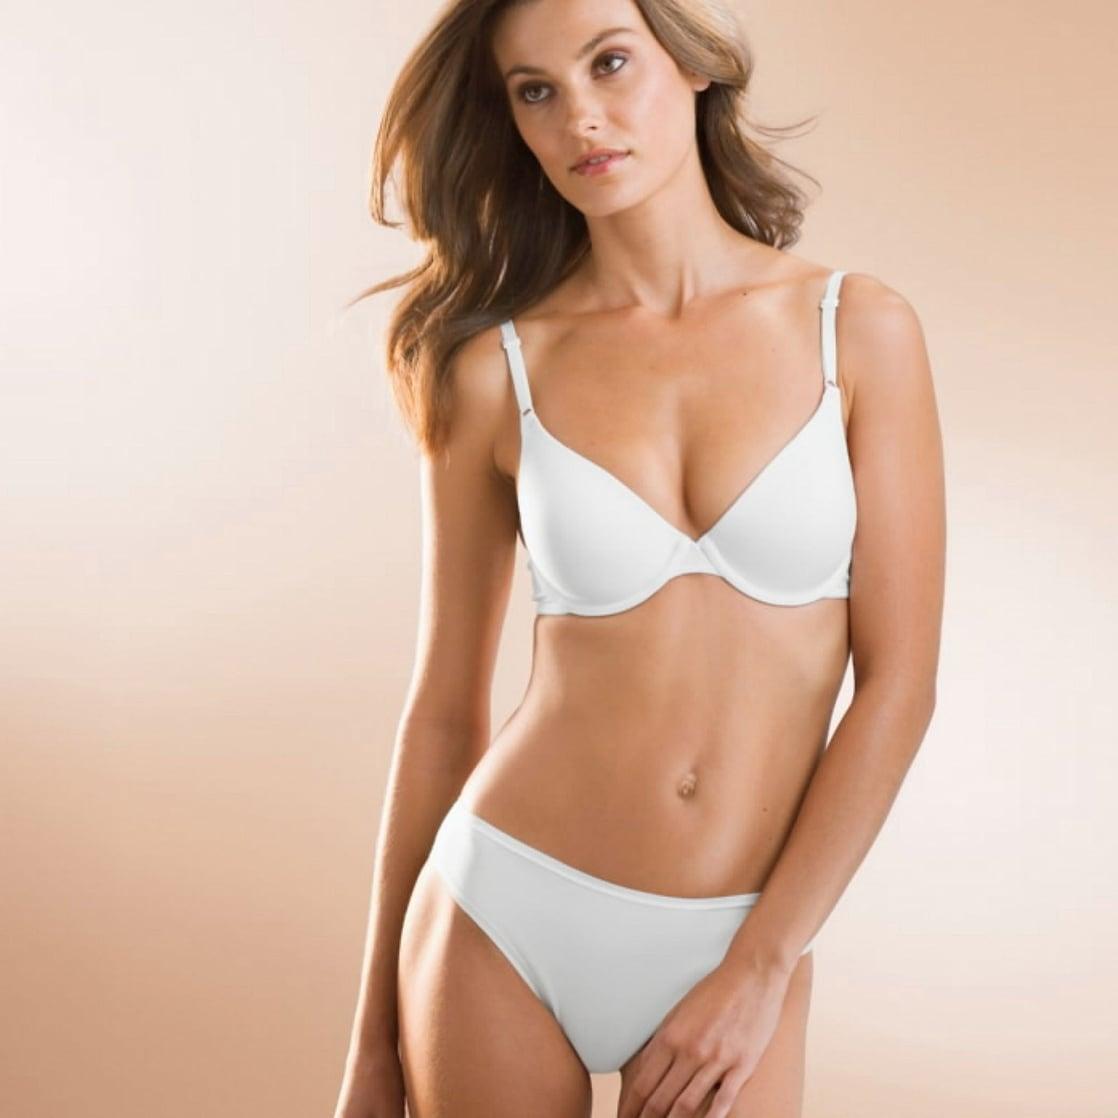 Bikini Aurelie Claudel naked (43 photo), Topless, Paparazzi, Boobs, legs 2020